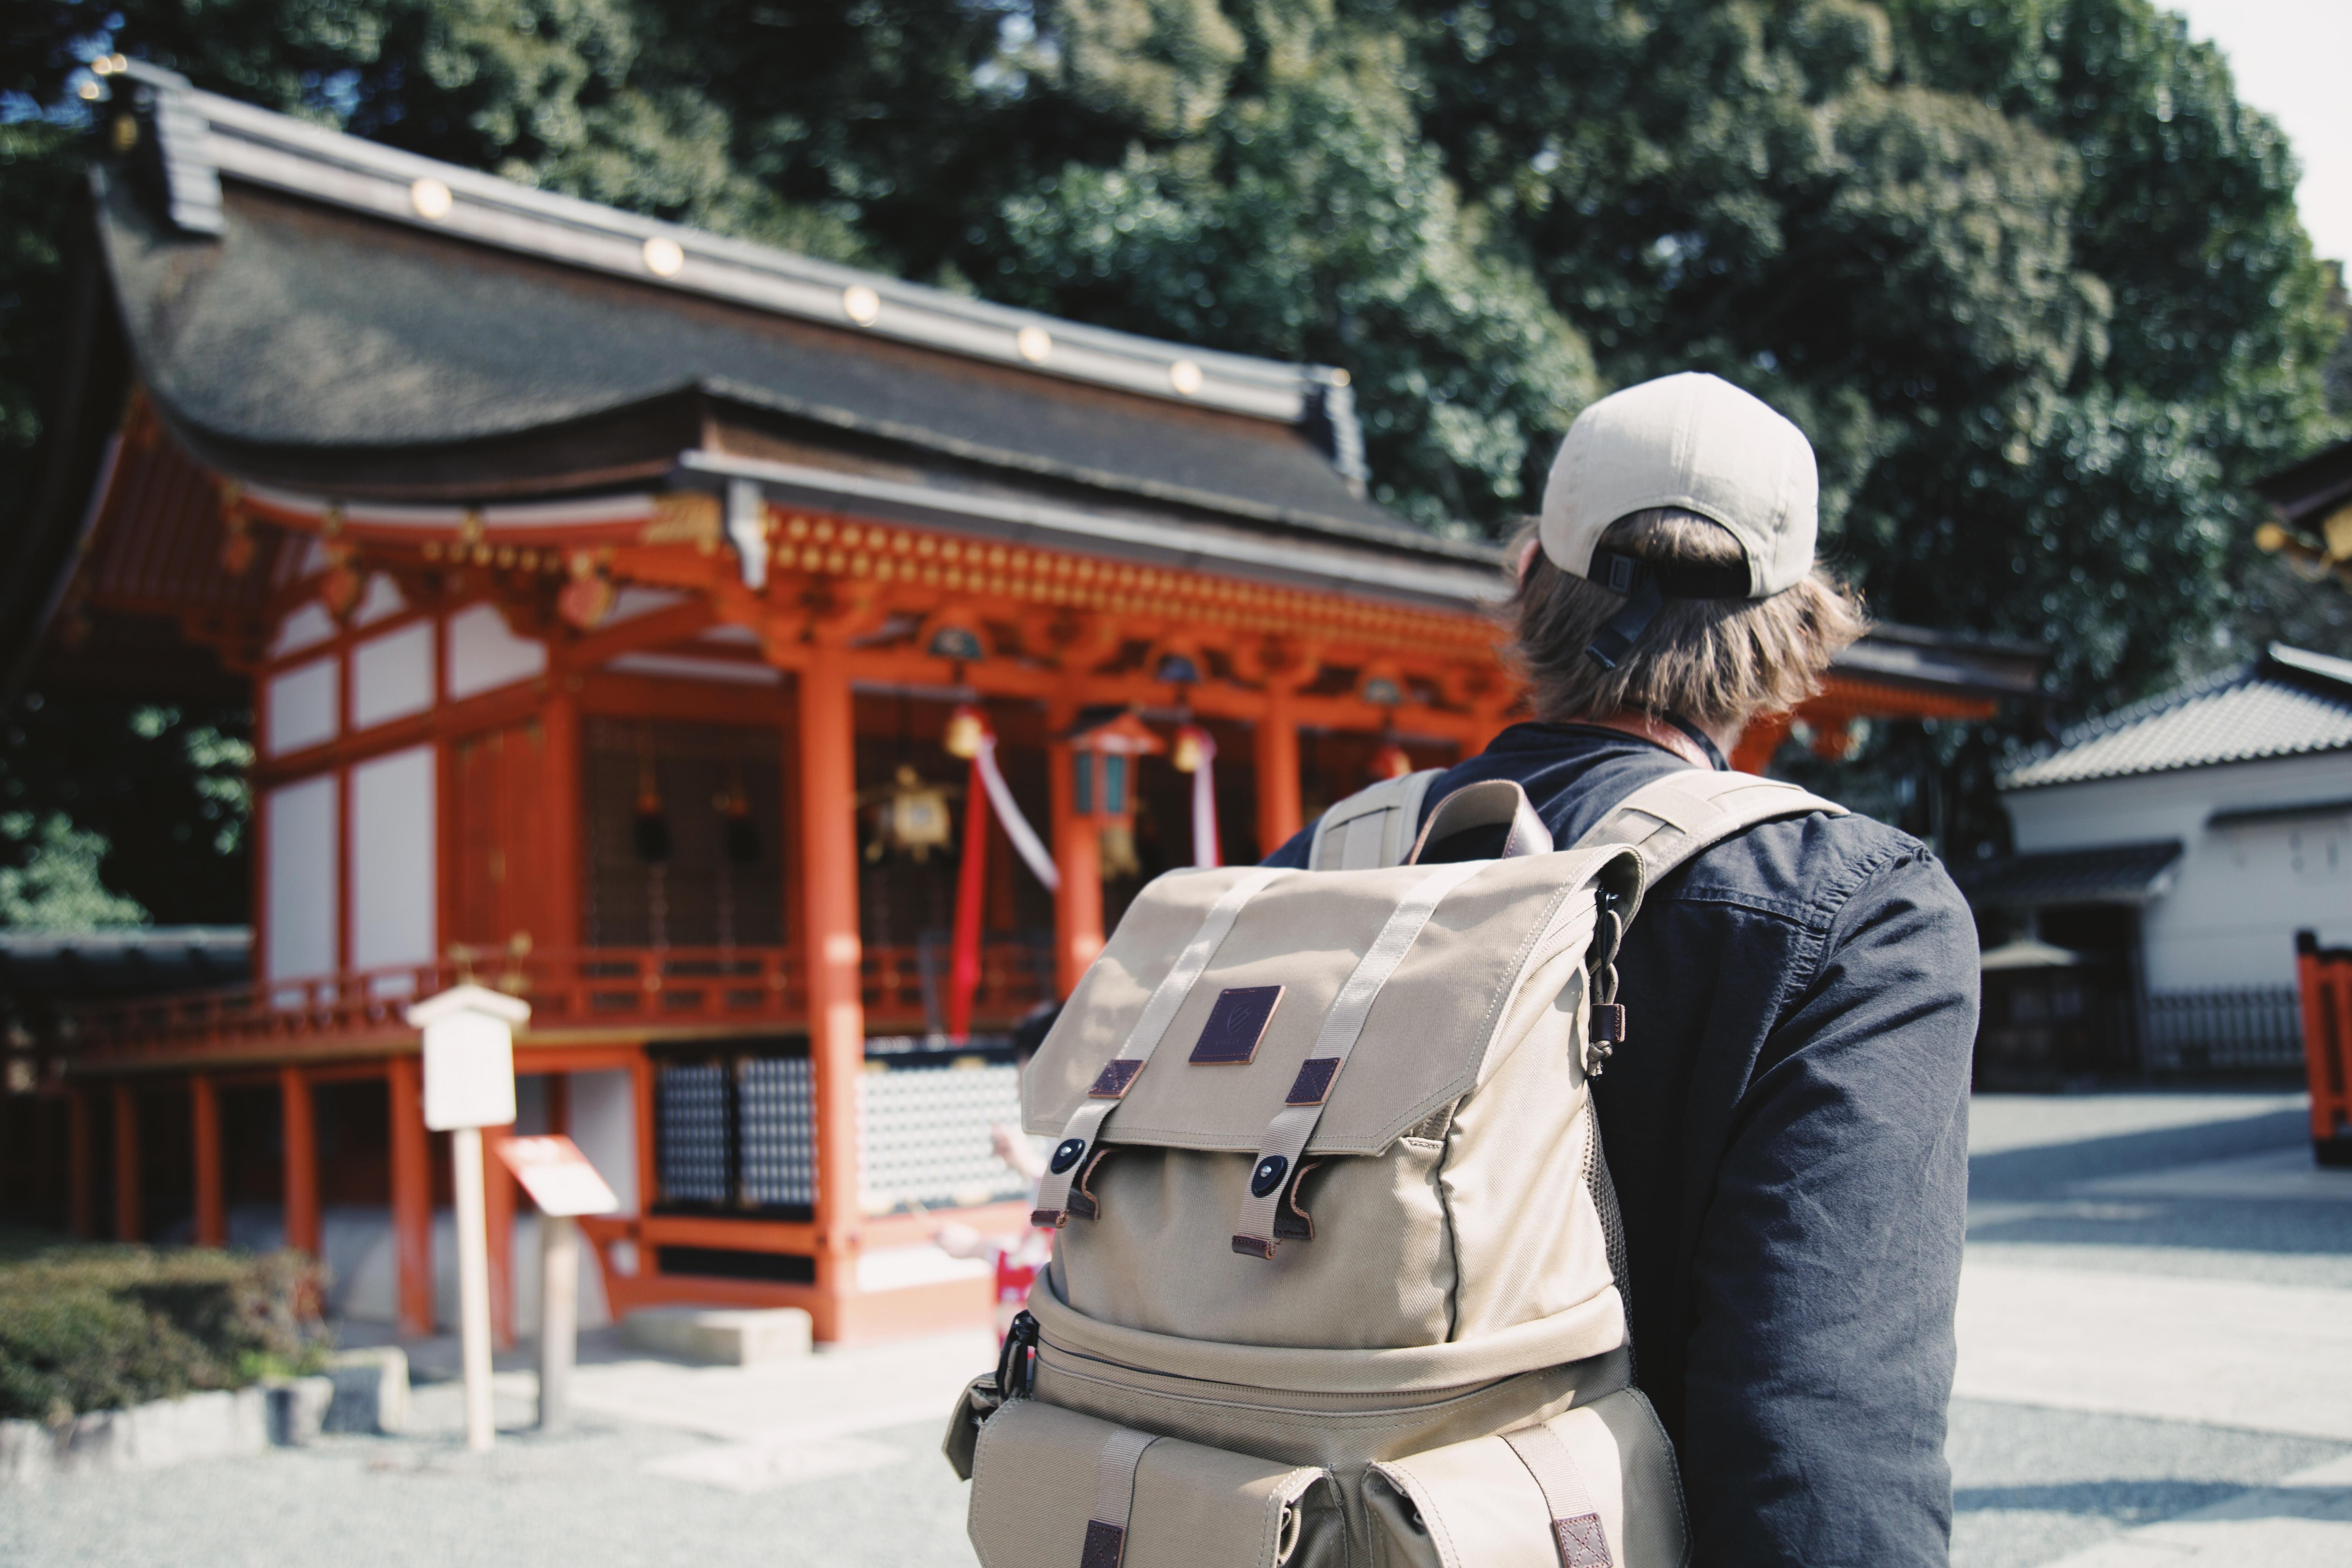 A person wearing a large backpack and baseball cap faces a building in Fushimi Inari Taisha